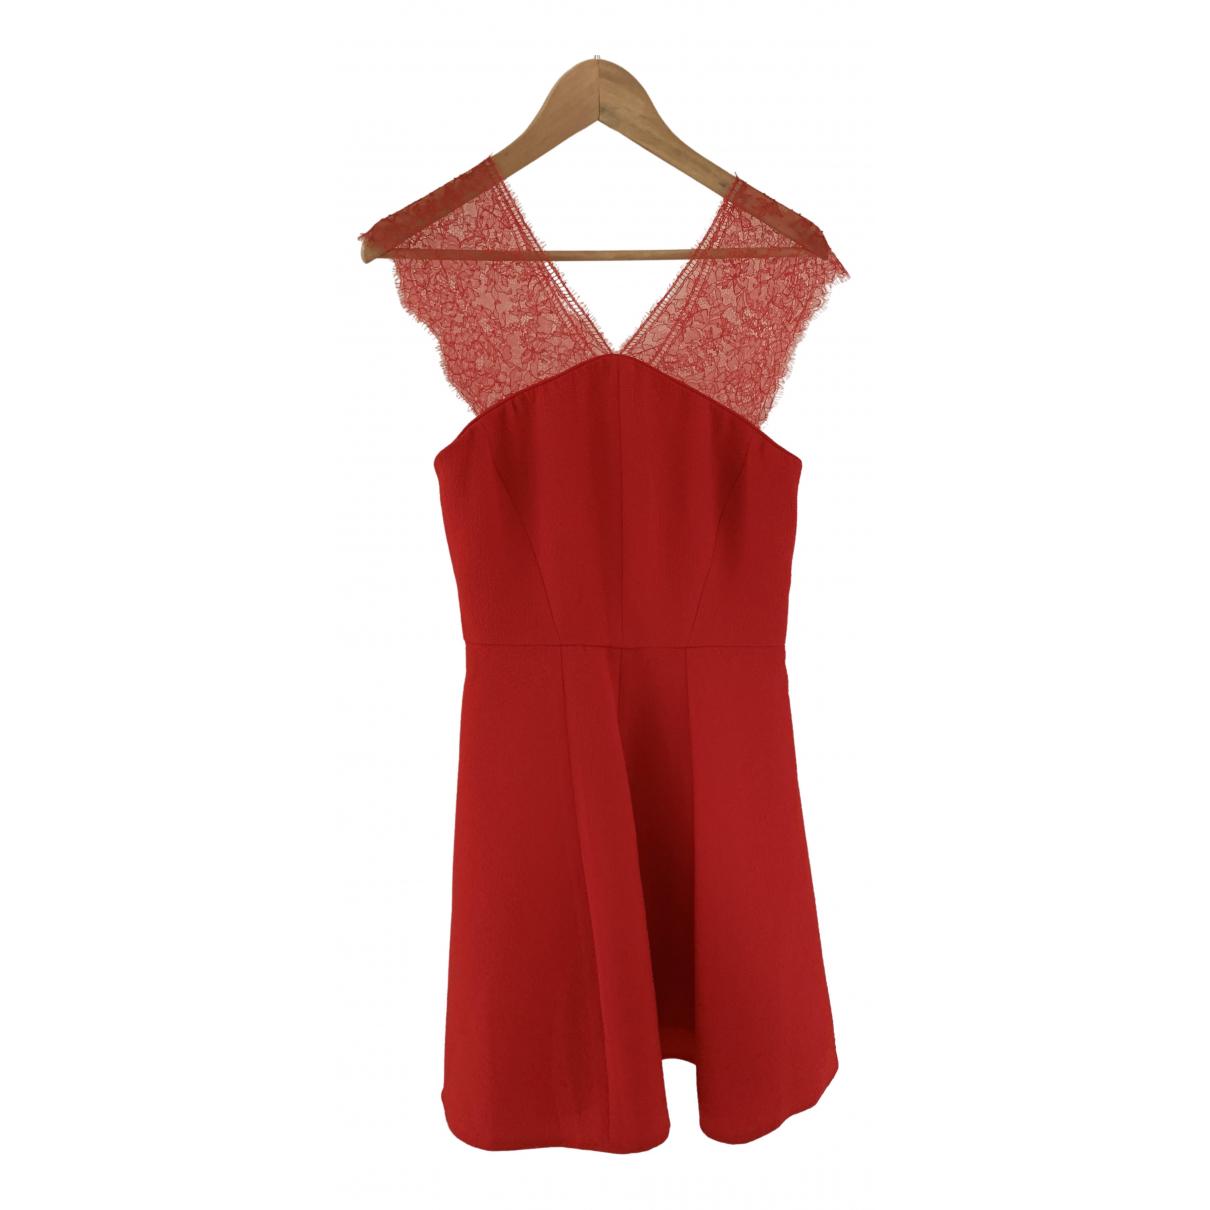 The Kooples \N Red dress for Women 40 FR